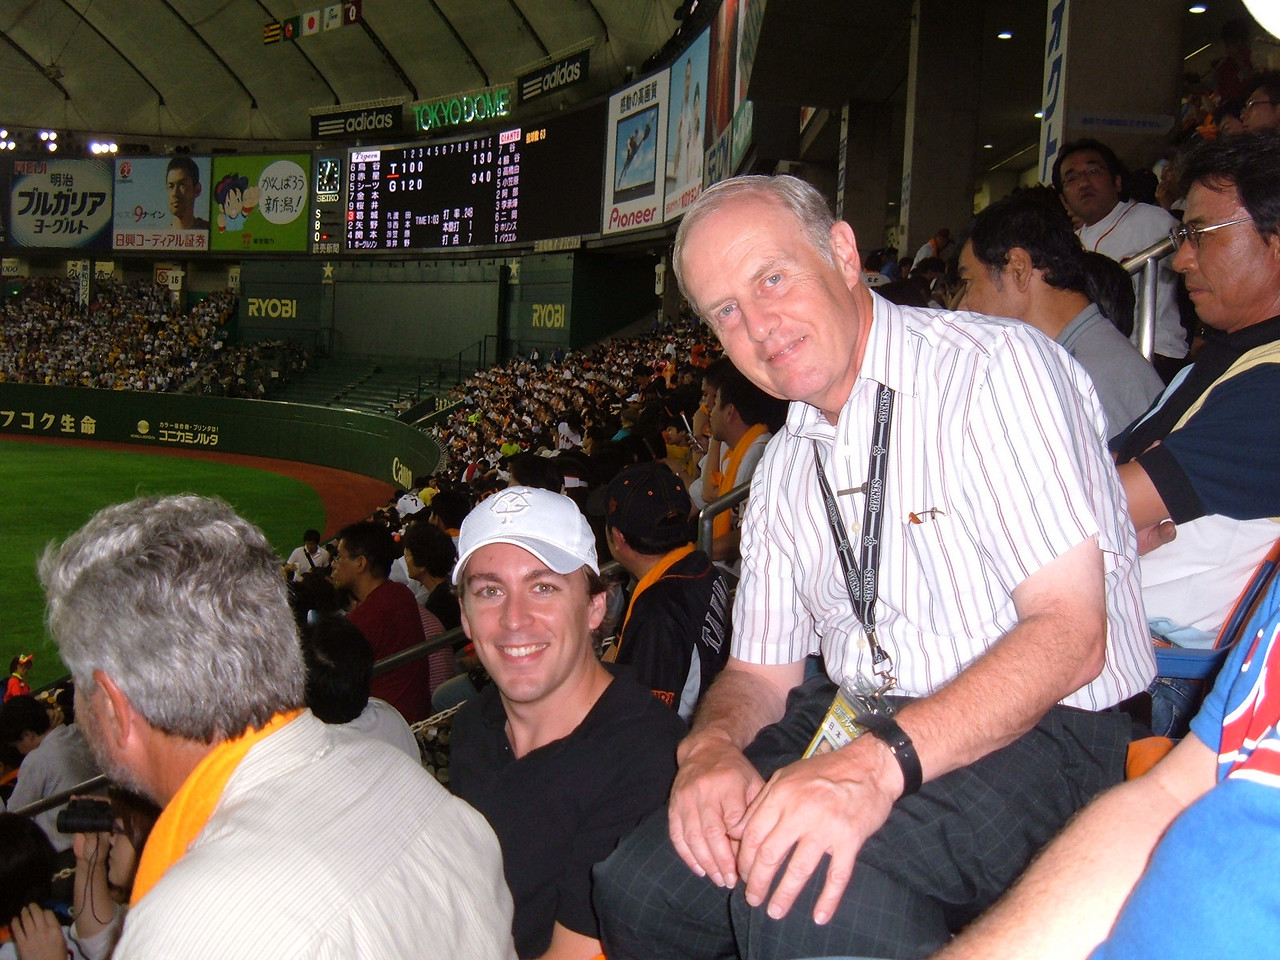 Jason Weitzel, Beerleaguer.com and Wayne Graczyk, The Japan Times